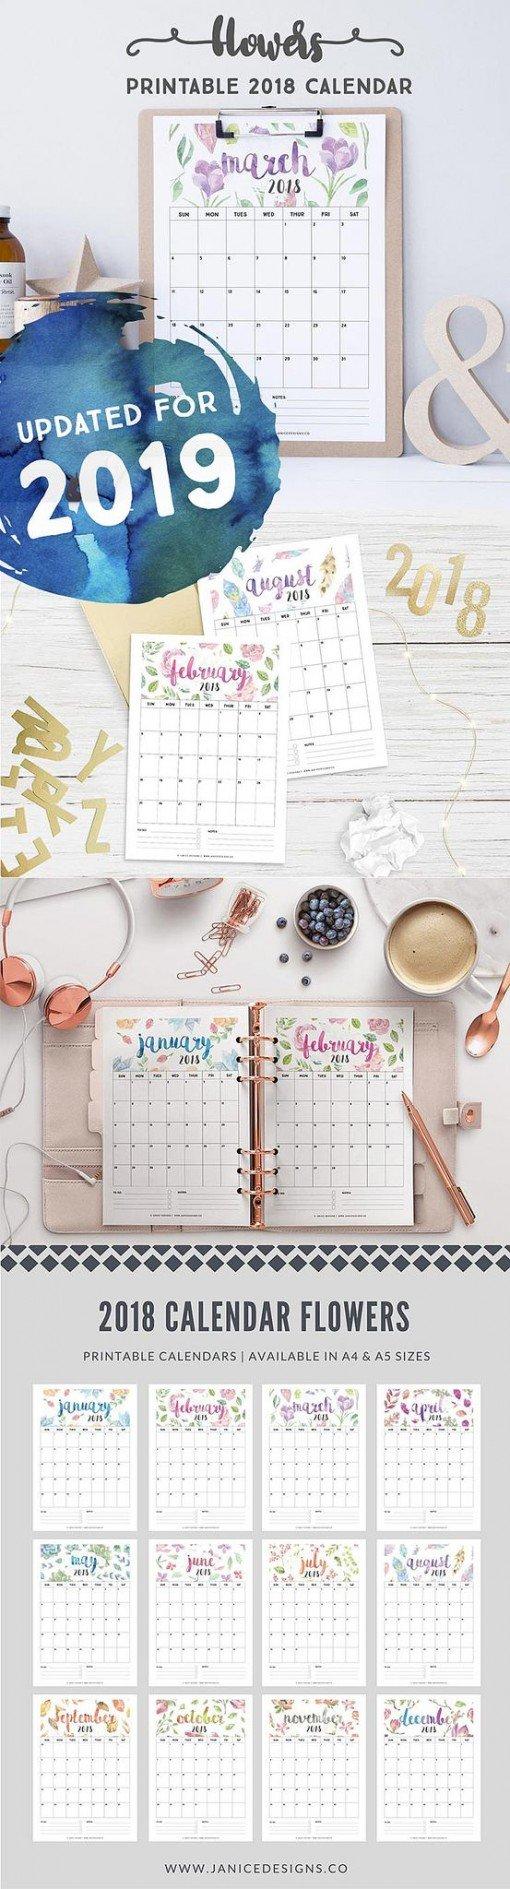 2019 Printable Calendar: Flowers